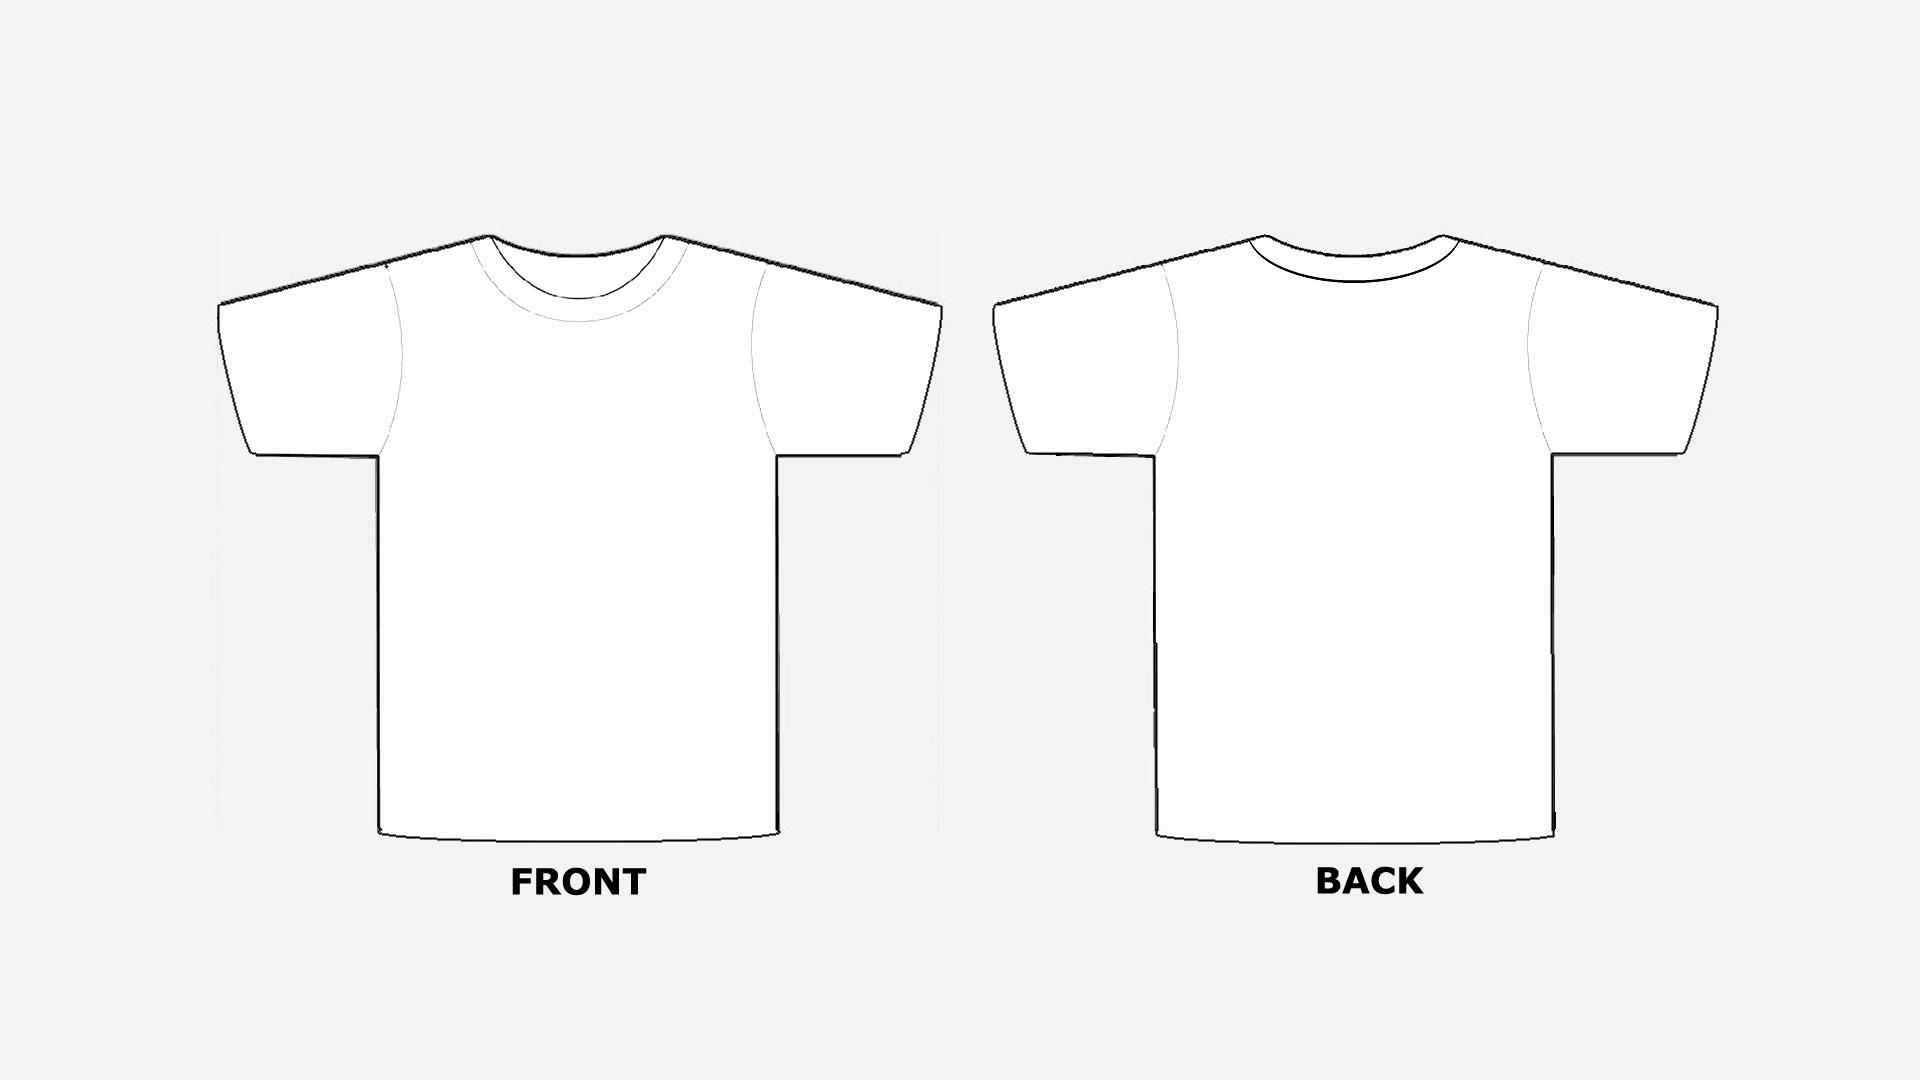 Free T Shirt Template Elegant Blank Tshirt Template Printable In Hd Hd Wallpapers